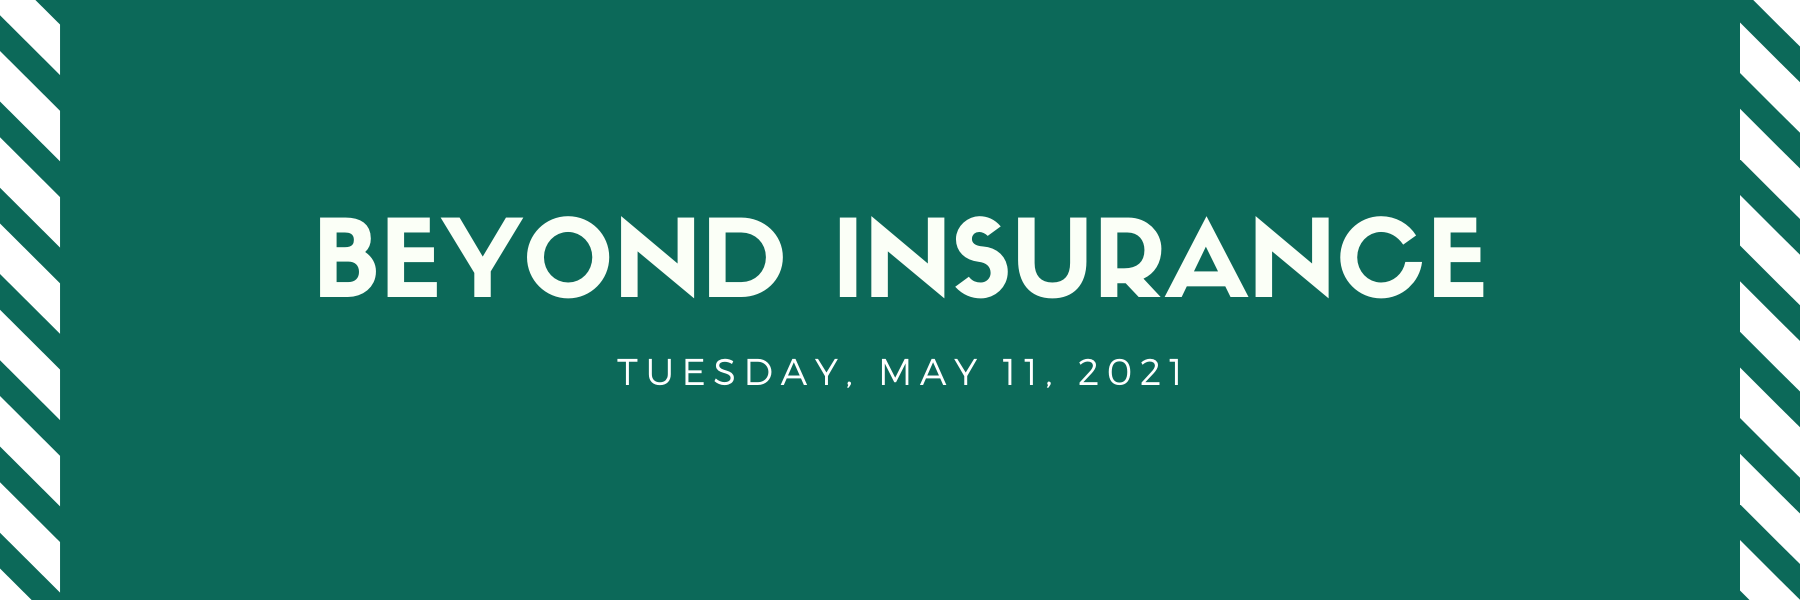 Beyond Insurance - May 11 Thumbnail